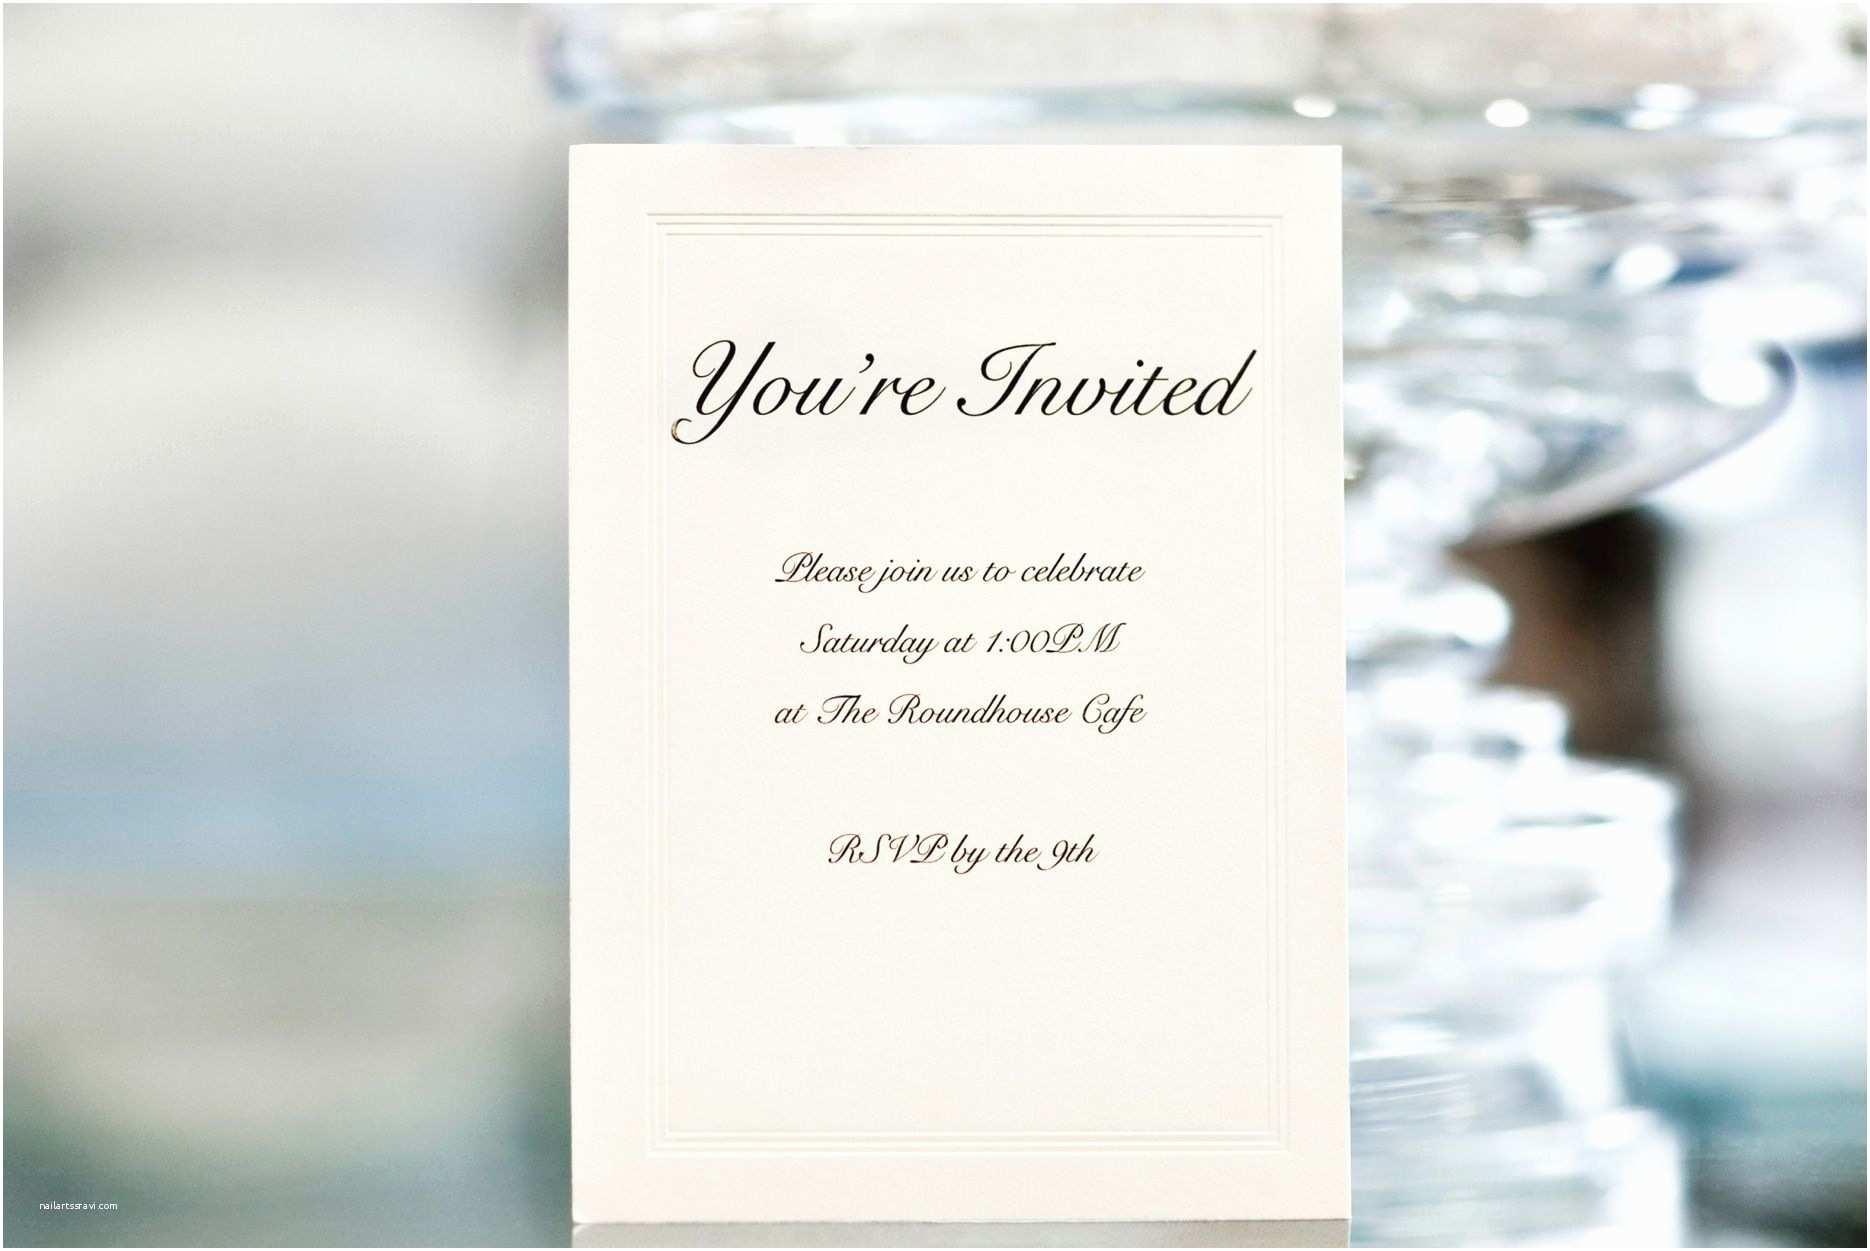 Wedding Ceremony Invitation Wording Card Template Wedding Ceremony Invitation Wording Card